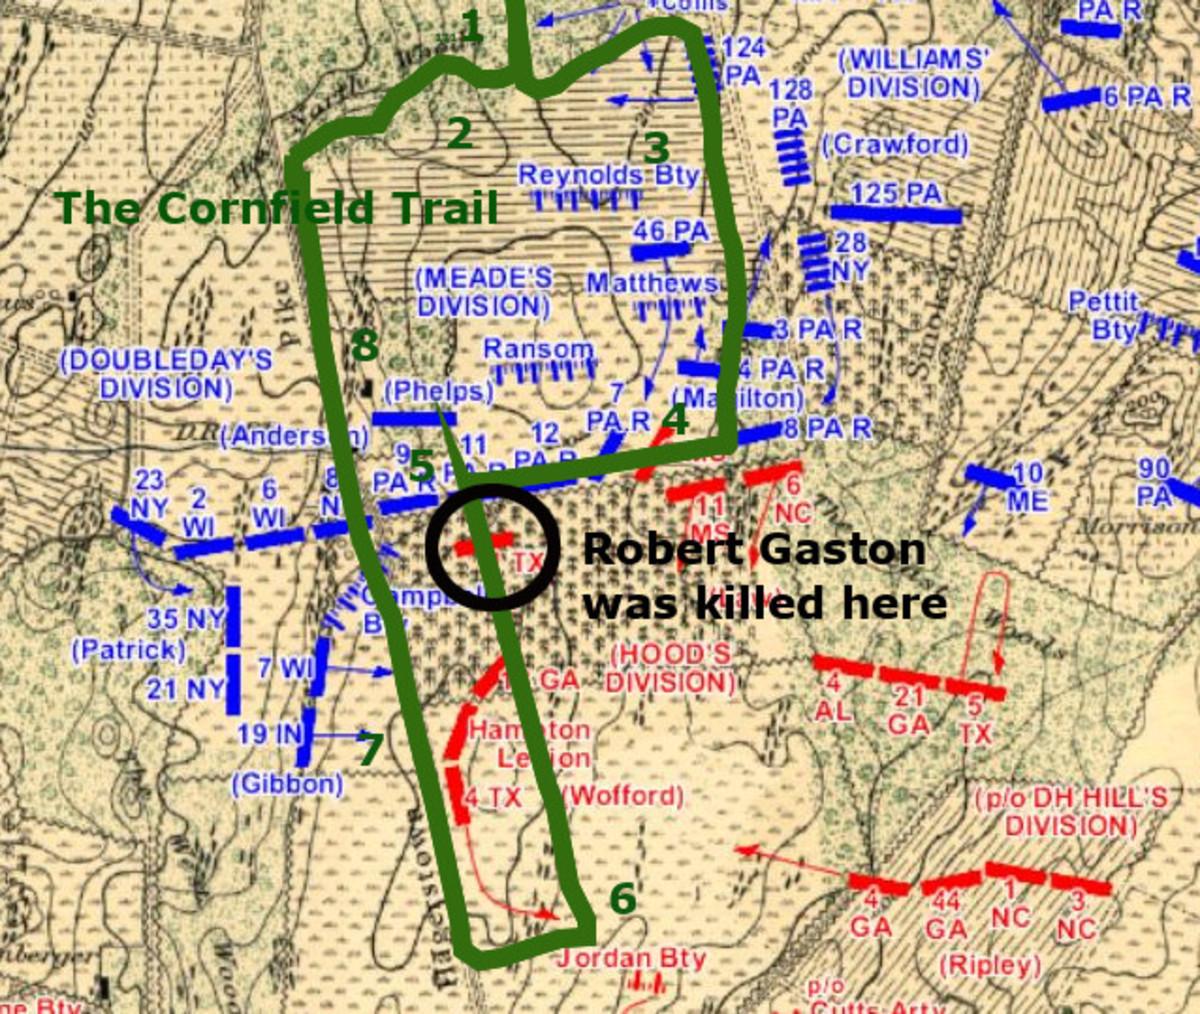 Robert Gaston was Killed Here | Bloody Cornfield Battle Map | The Cornfield Trail